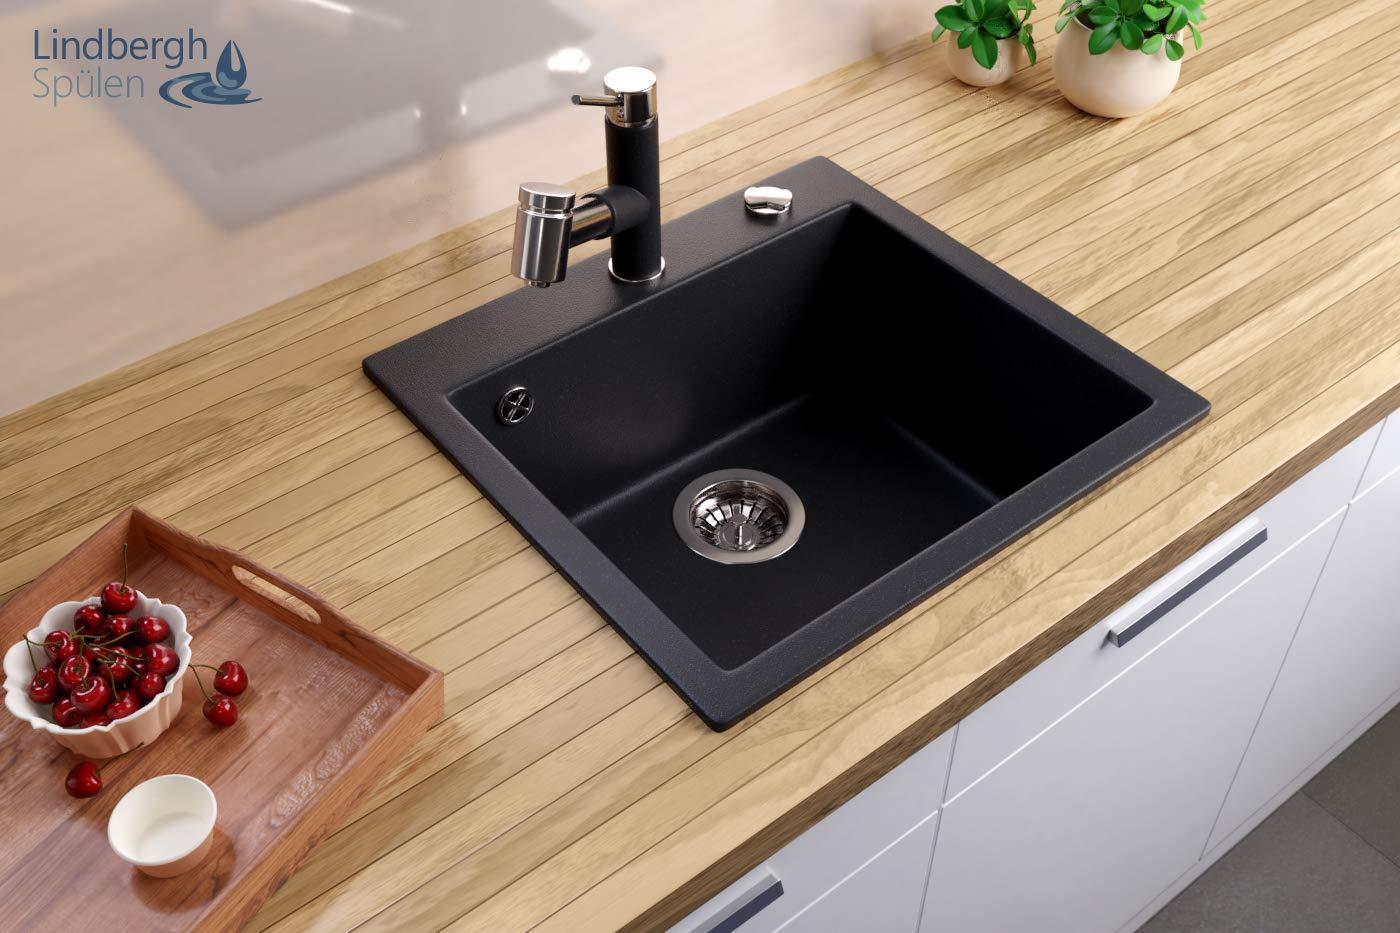 Siphon Einbauspüle Küchenspüle KÜCHE Becken LINDBERGH® Granit